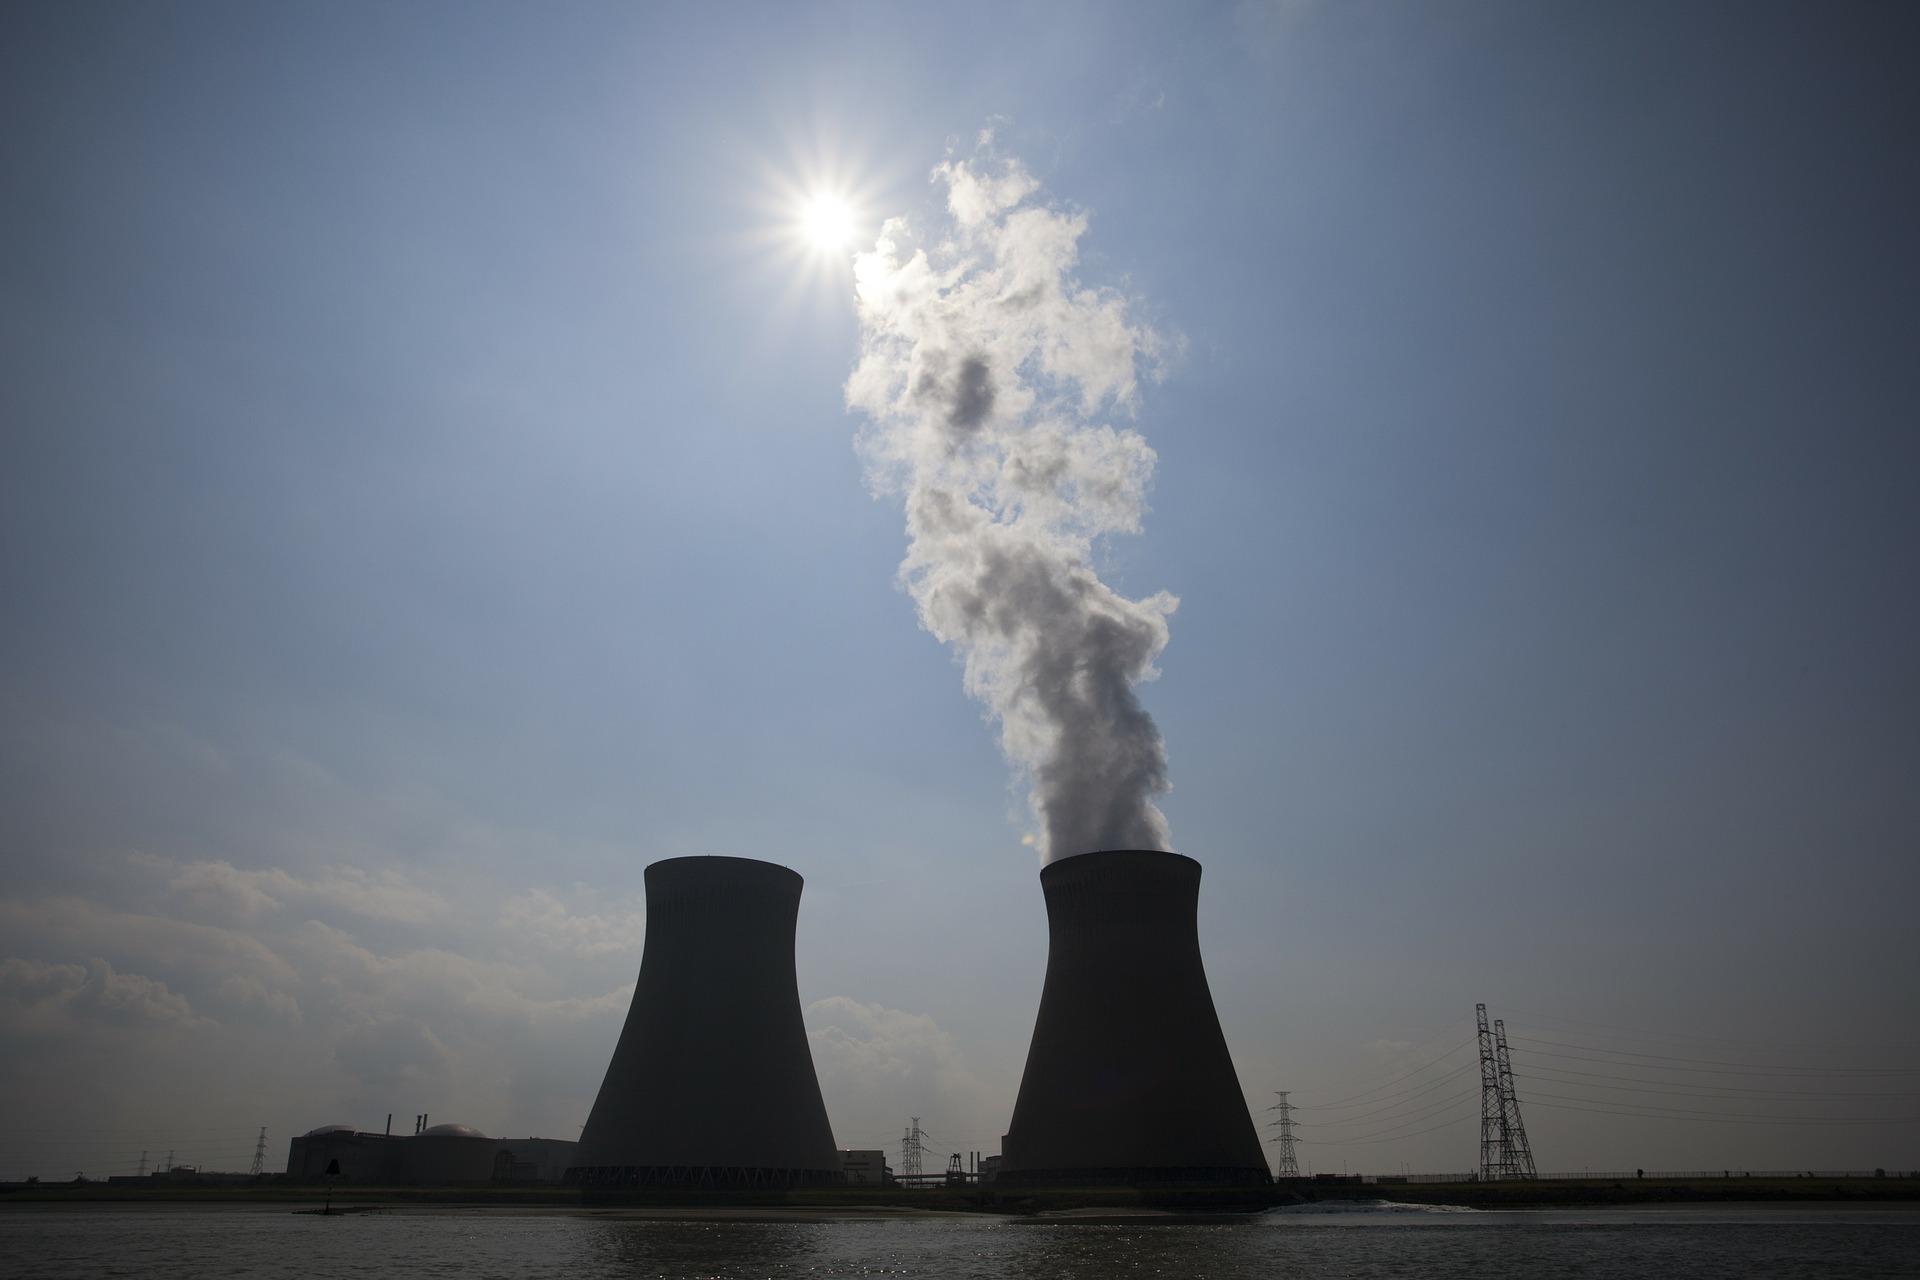 inde edf six epr centrale nucleaire jaitapur - L'Energeek